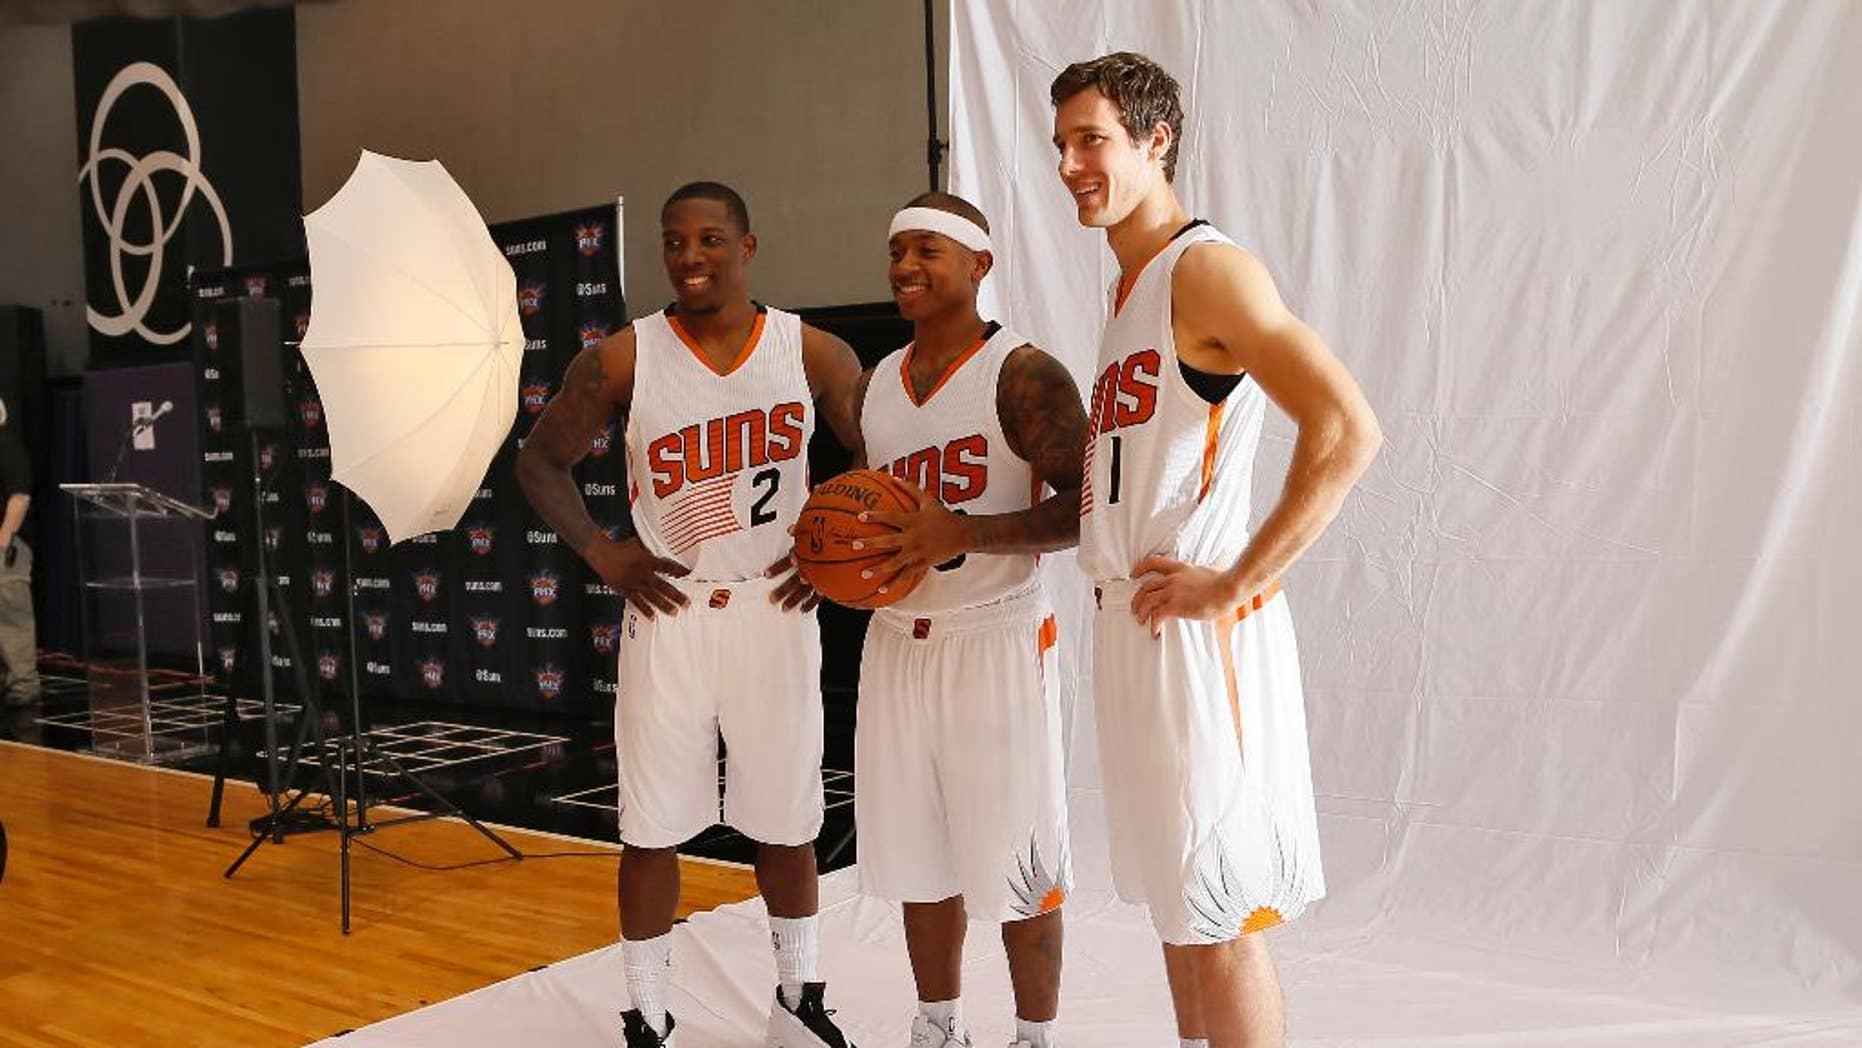 Phoenix Suns' Goran Dragic (1), of Slovenia, Isaiah Thomas, center, and Eric Bledsoe pose for a photo during NBA basketball media day, Monday, Sept. 29, 2014, in Phoenix. (AP Photo/Matt York)